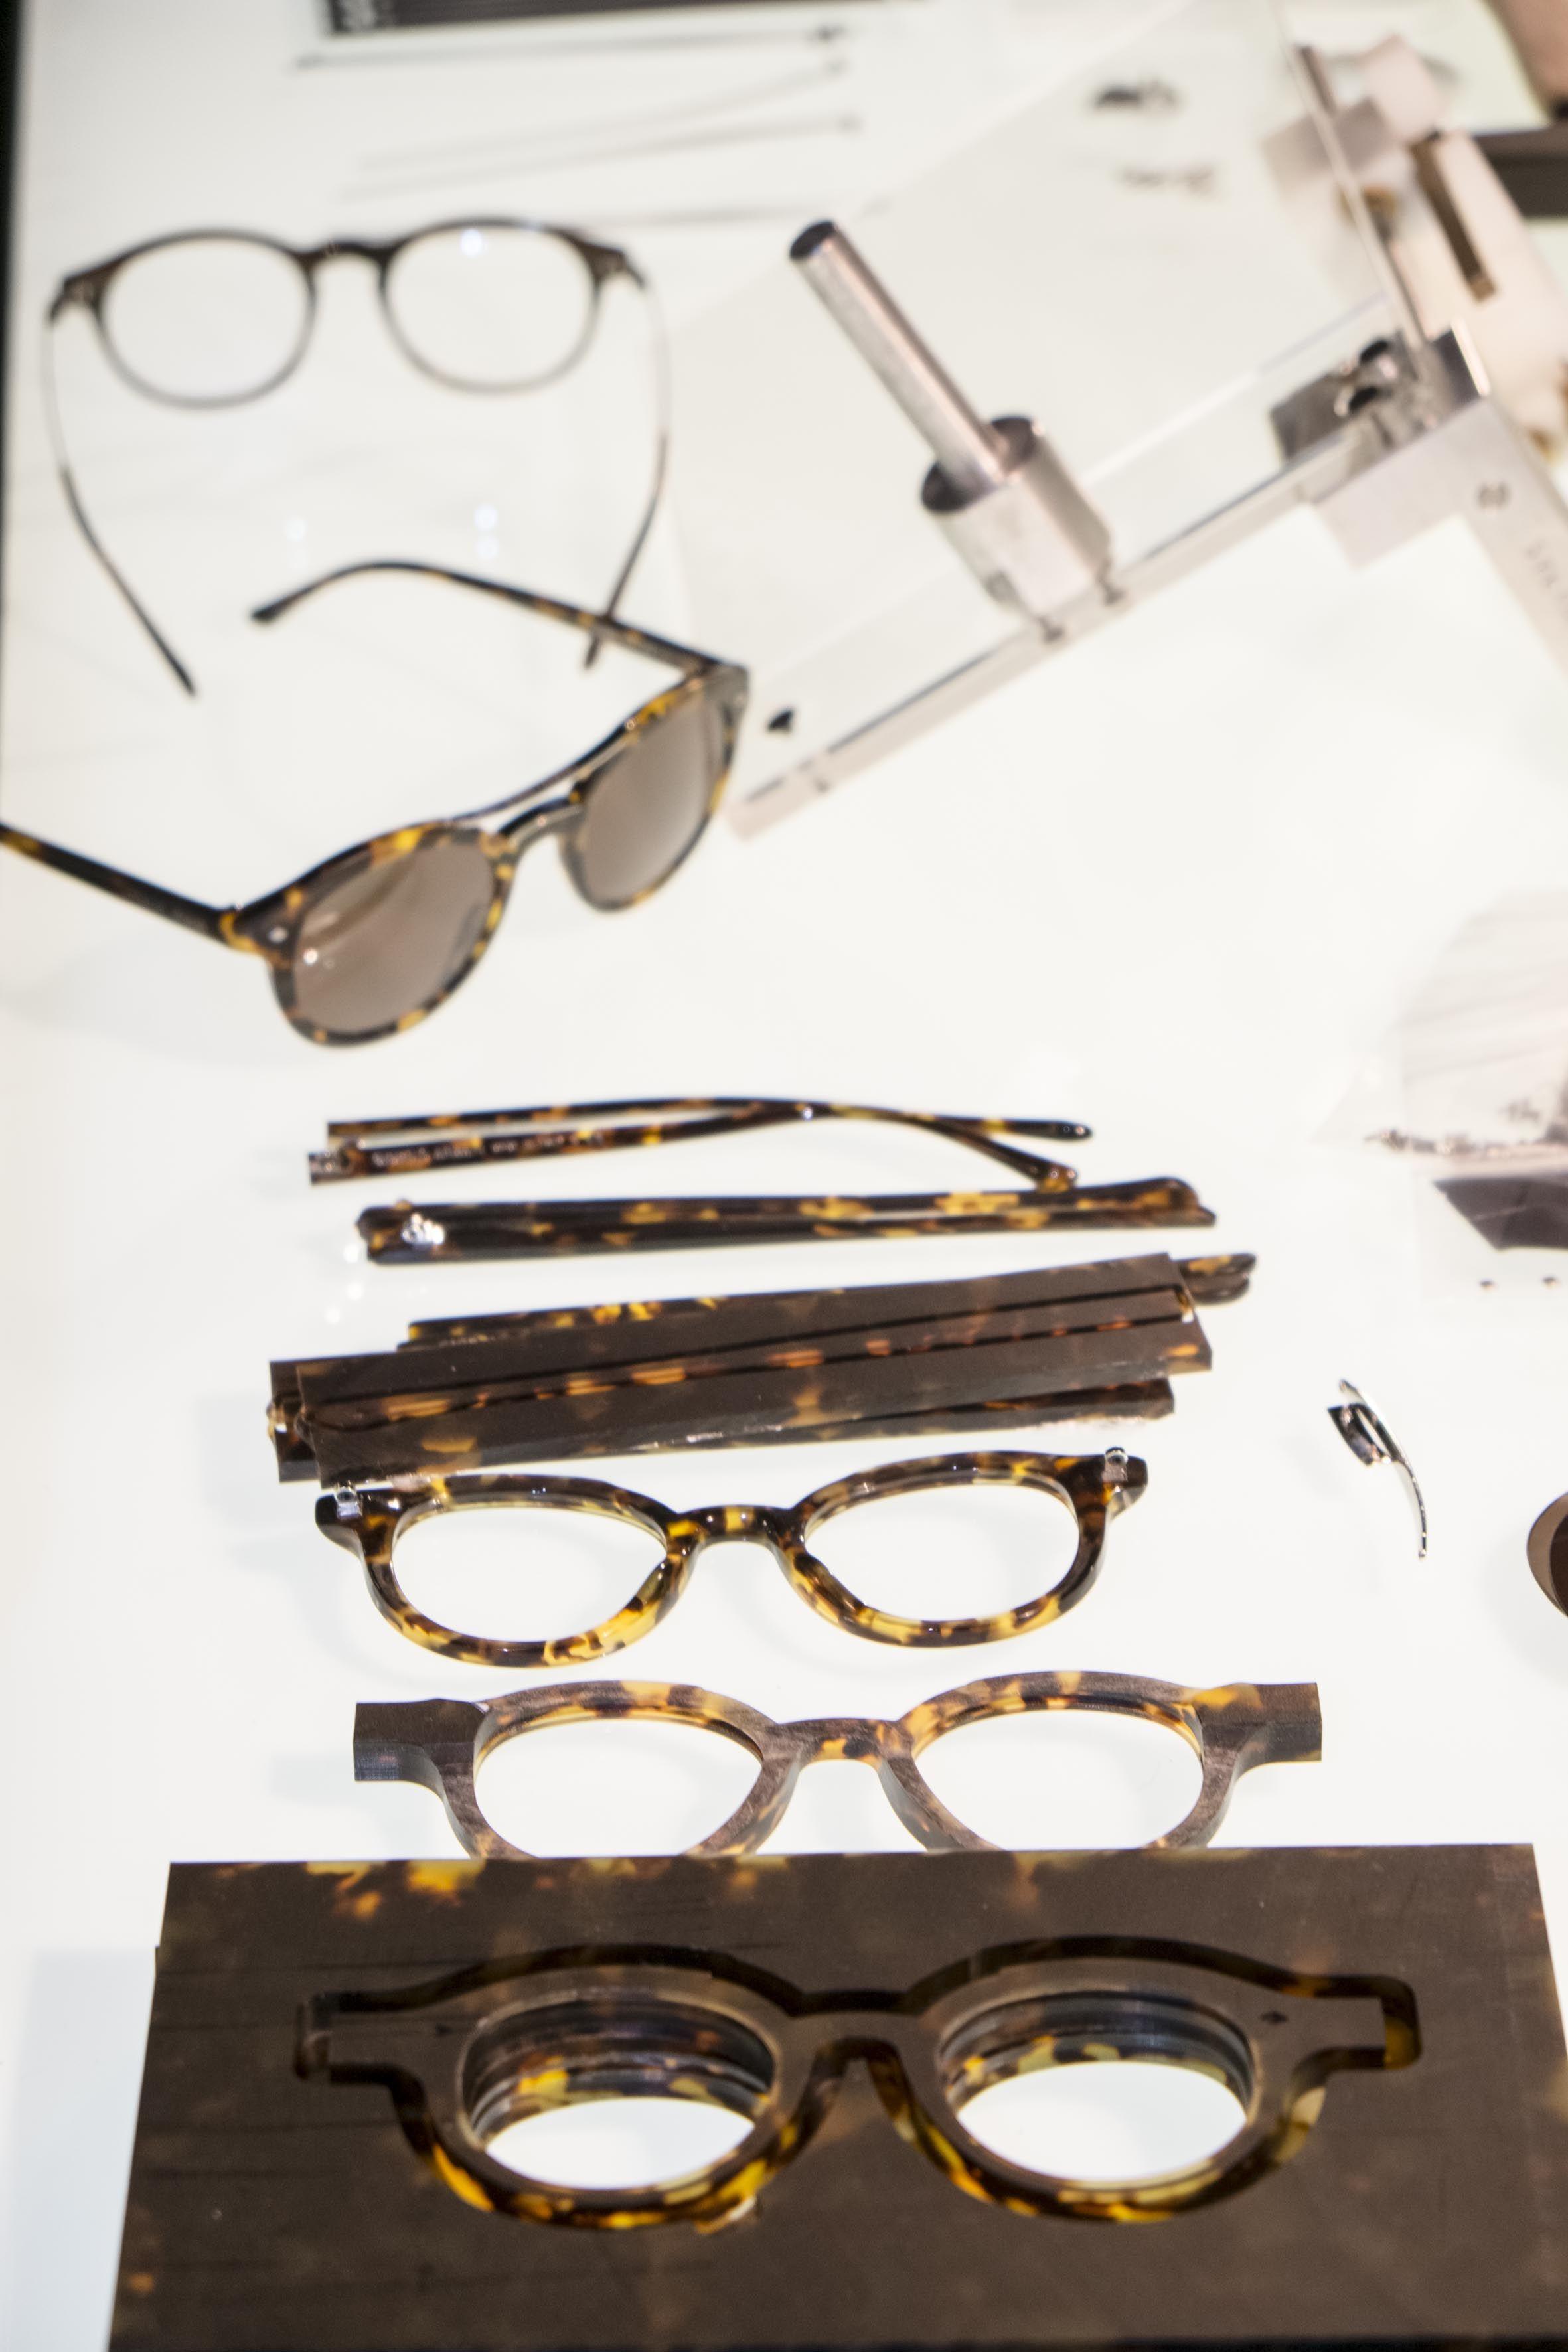 a27f7e6a909 our prototyps for Armani Eyewear  Luxottica  craftsmenship ...